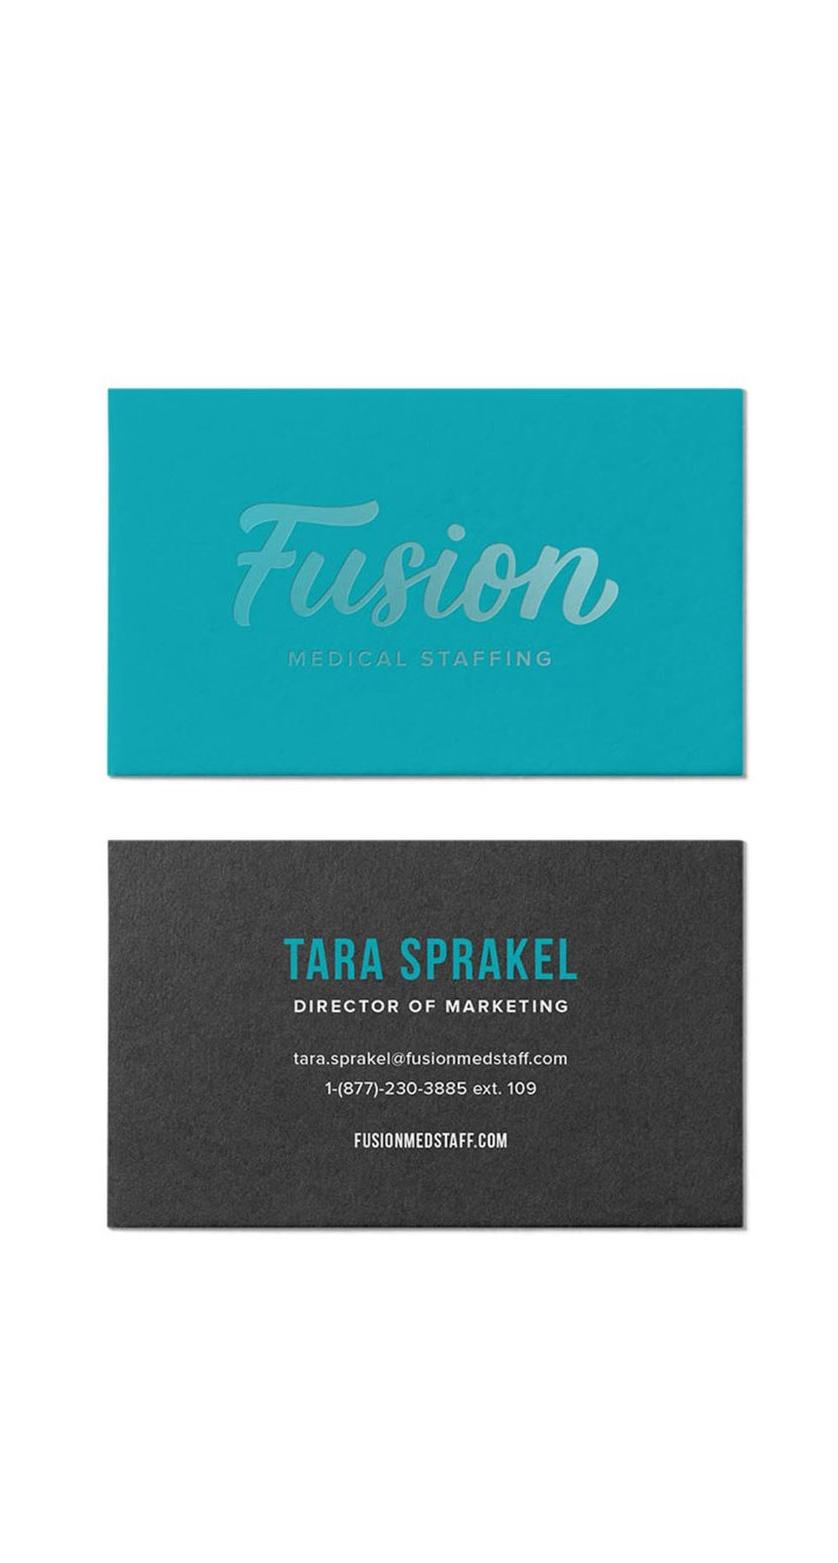 Fruitful Design Strategy Omaha Nebraska Fusion Business Cards.jpg